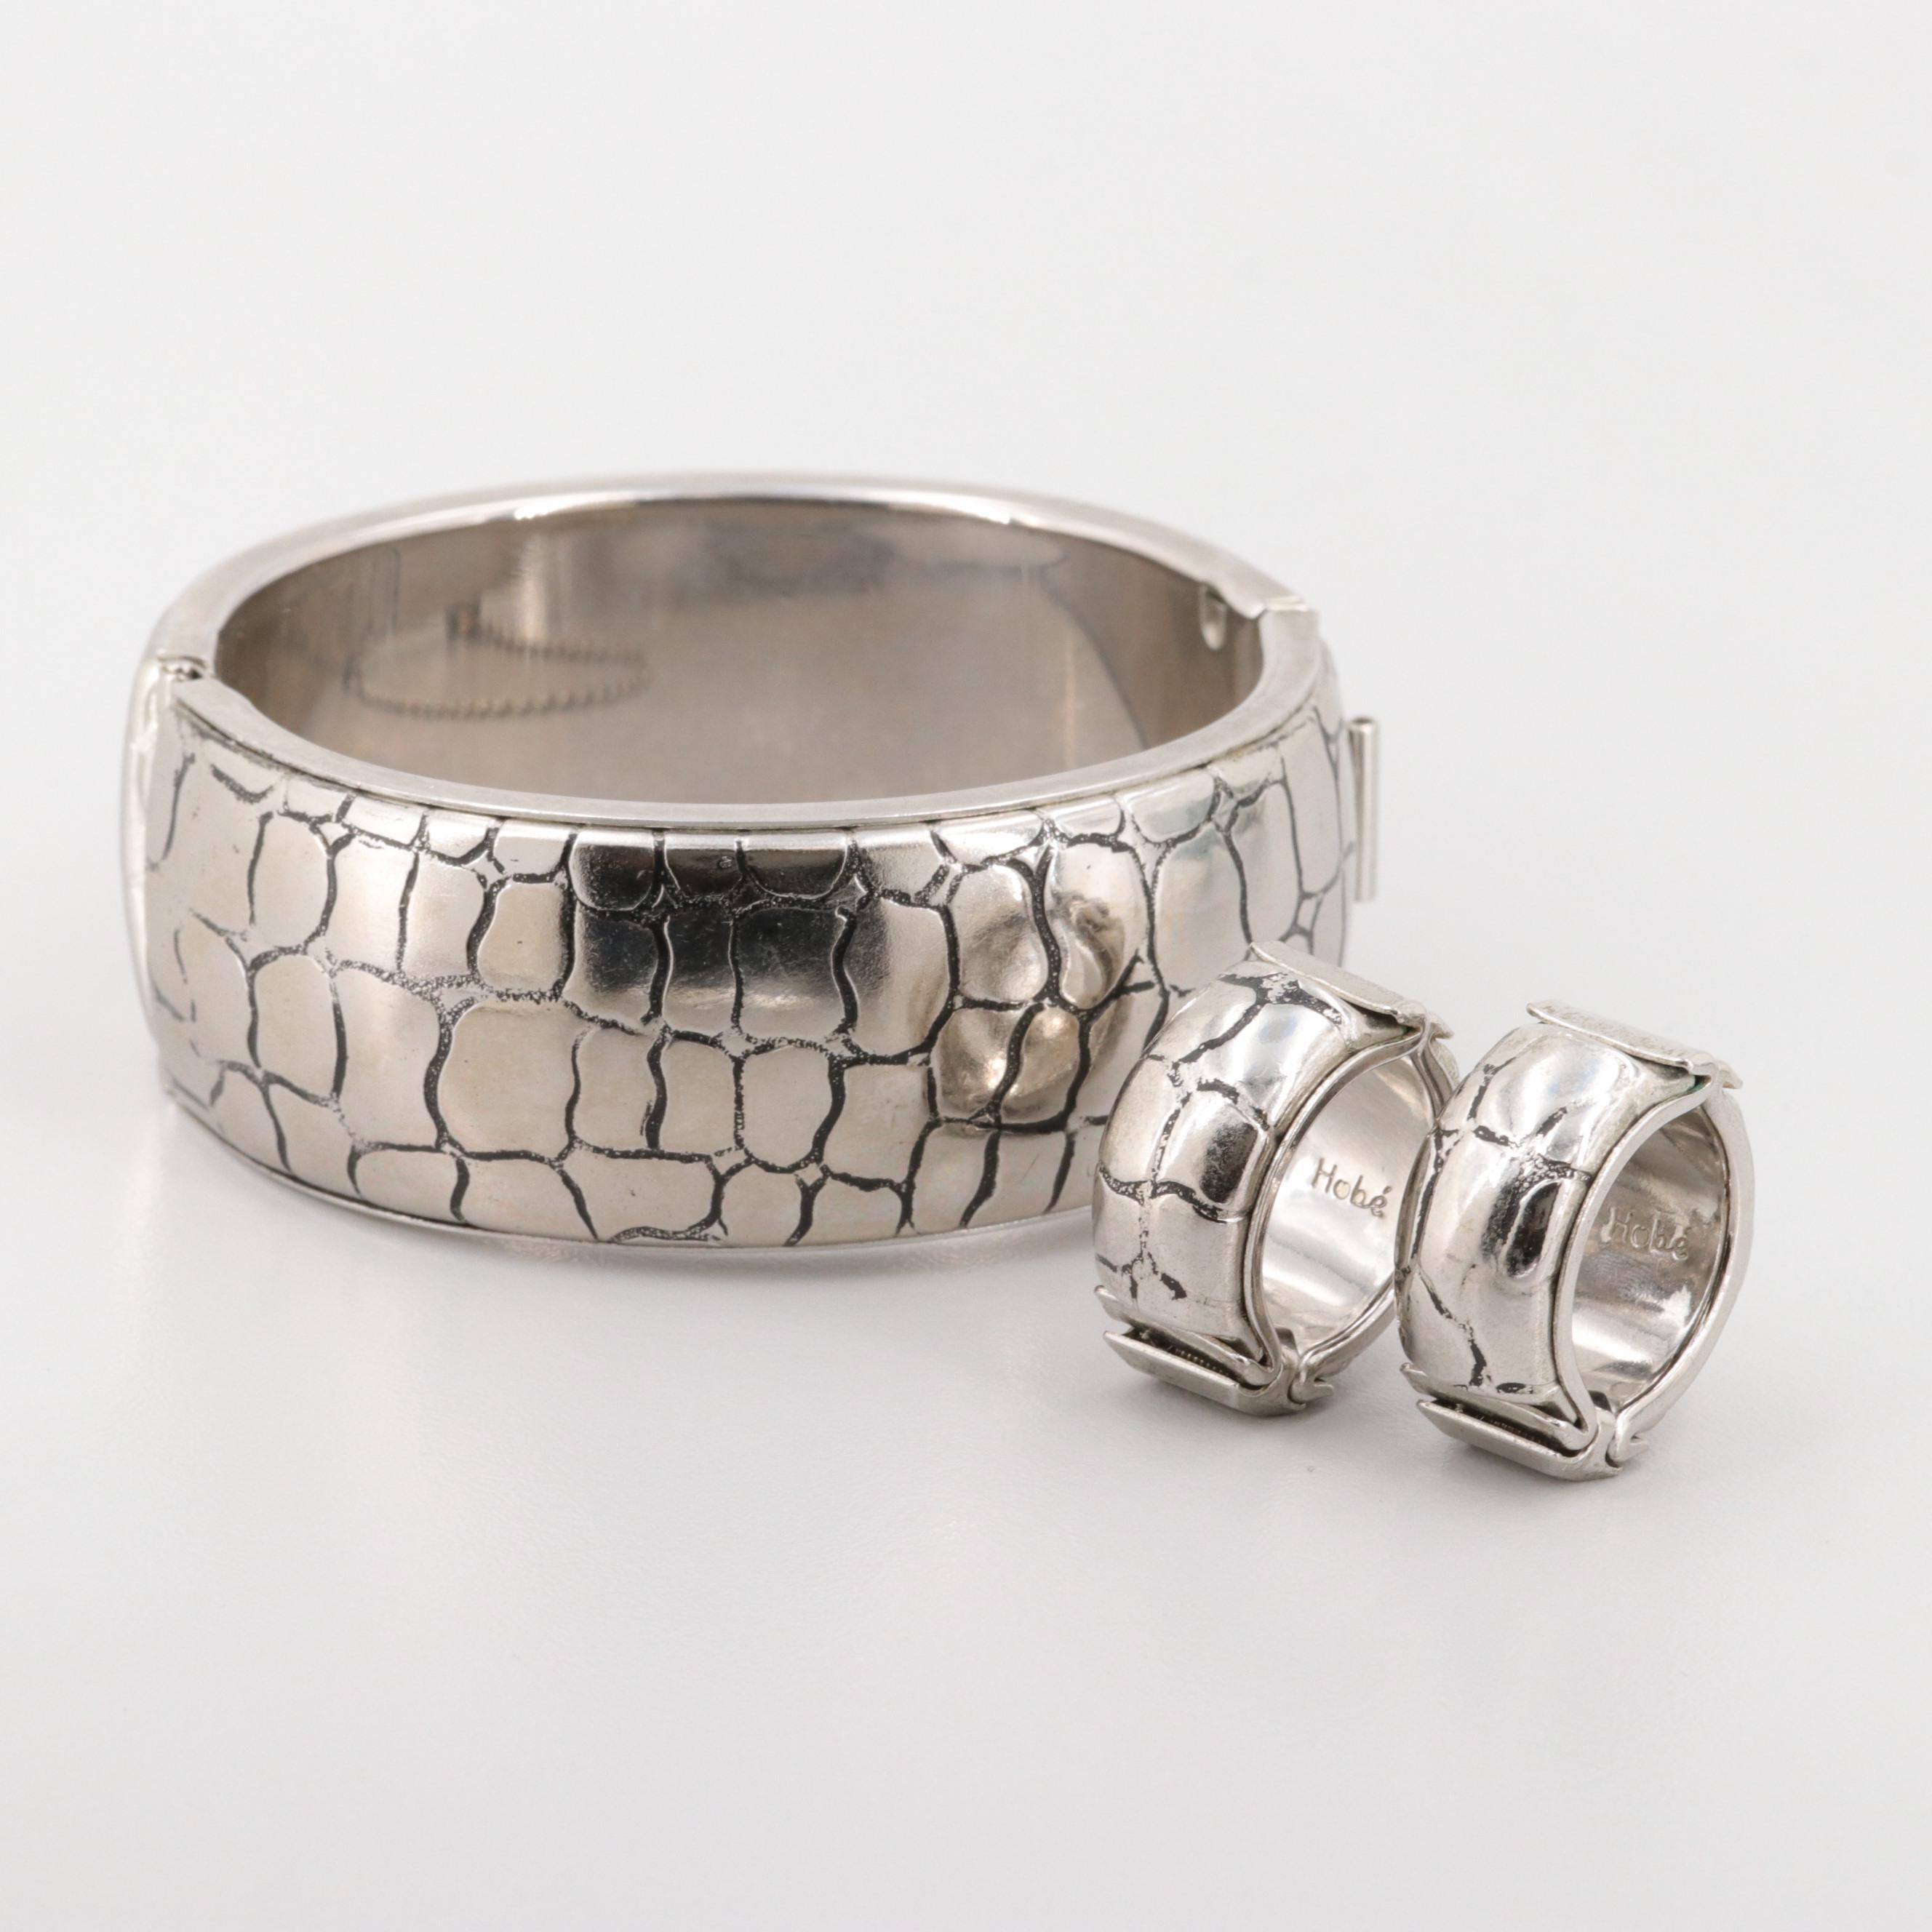 Hobé Silver Tone Bangle Bracelet and Earrings